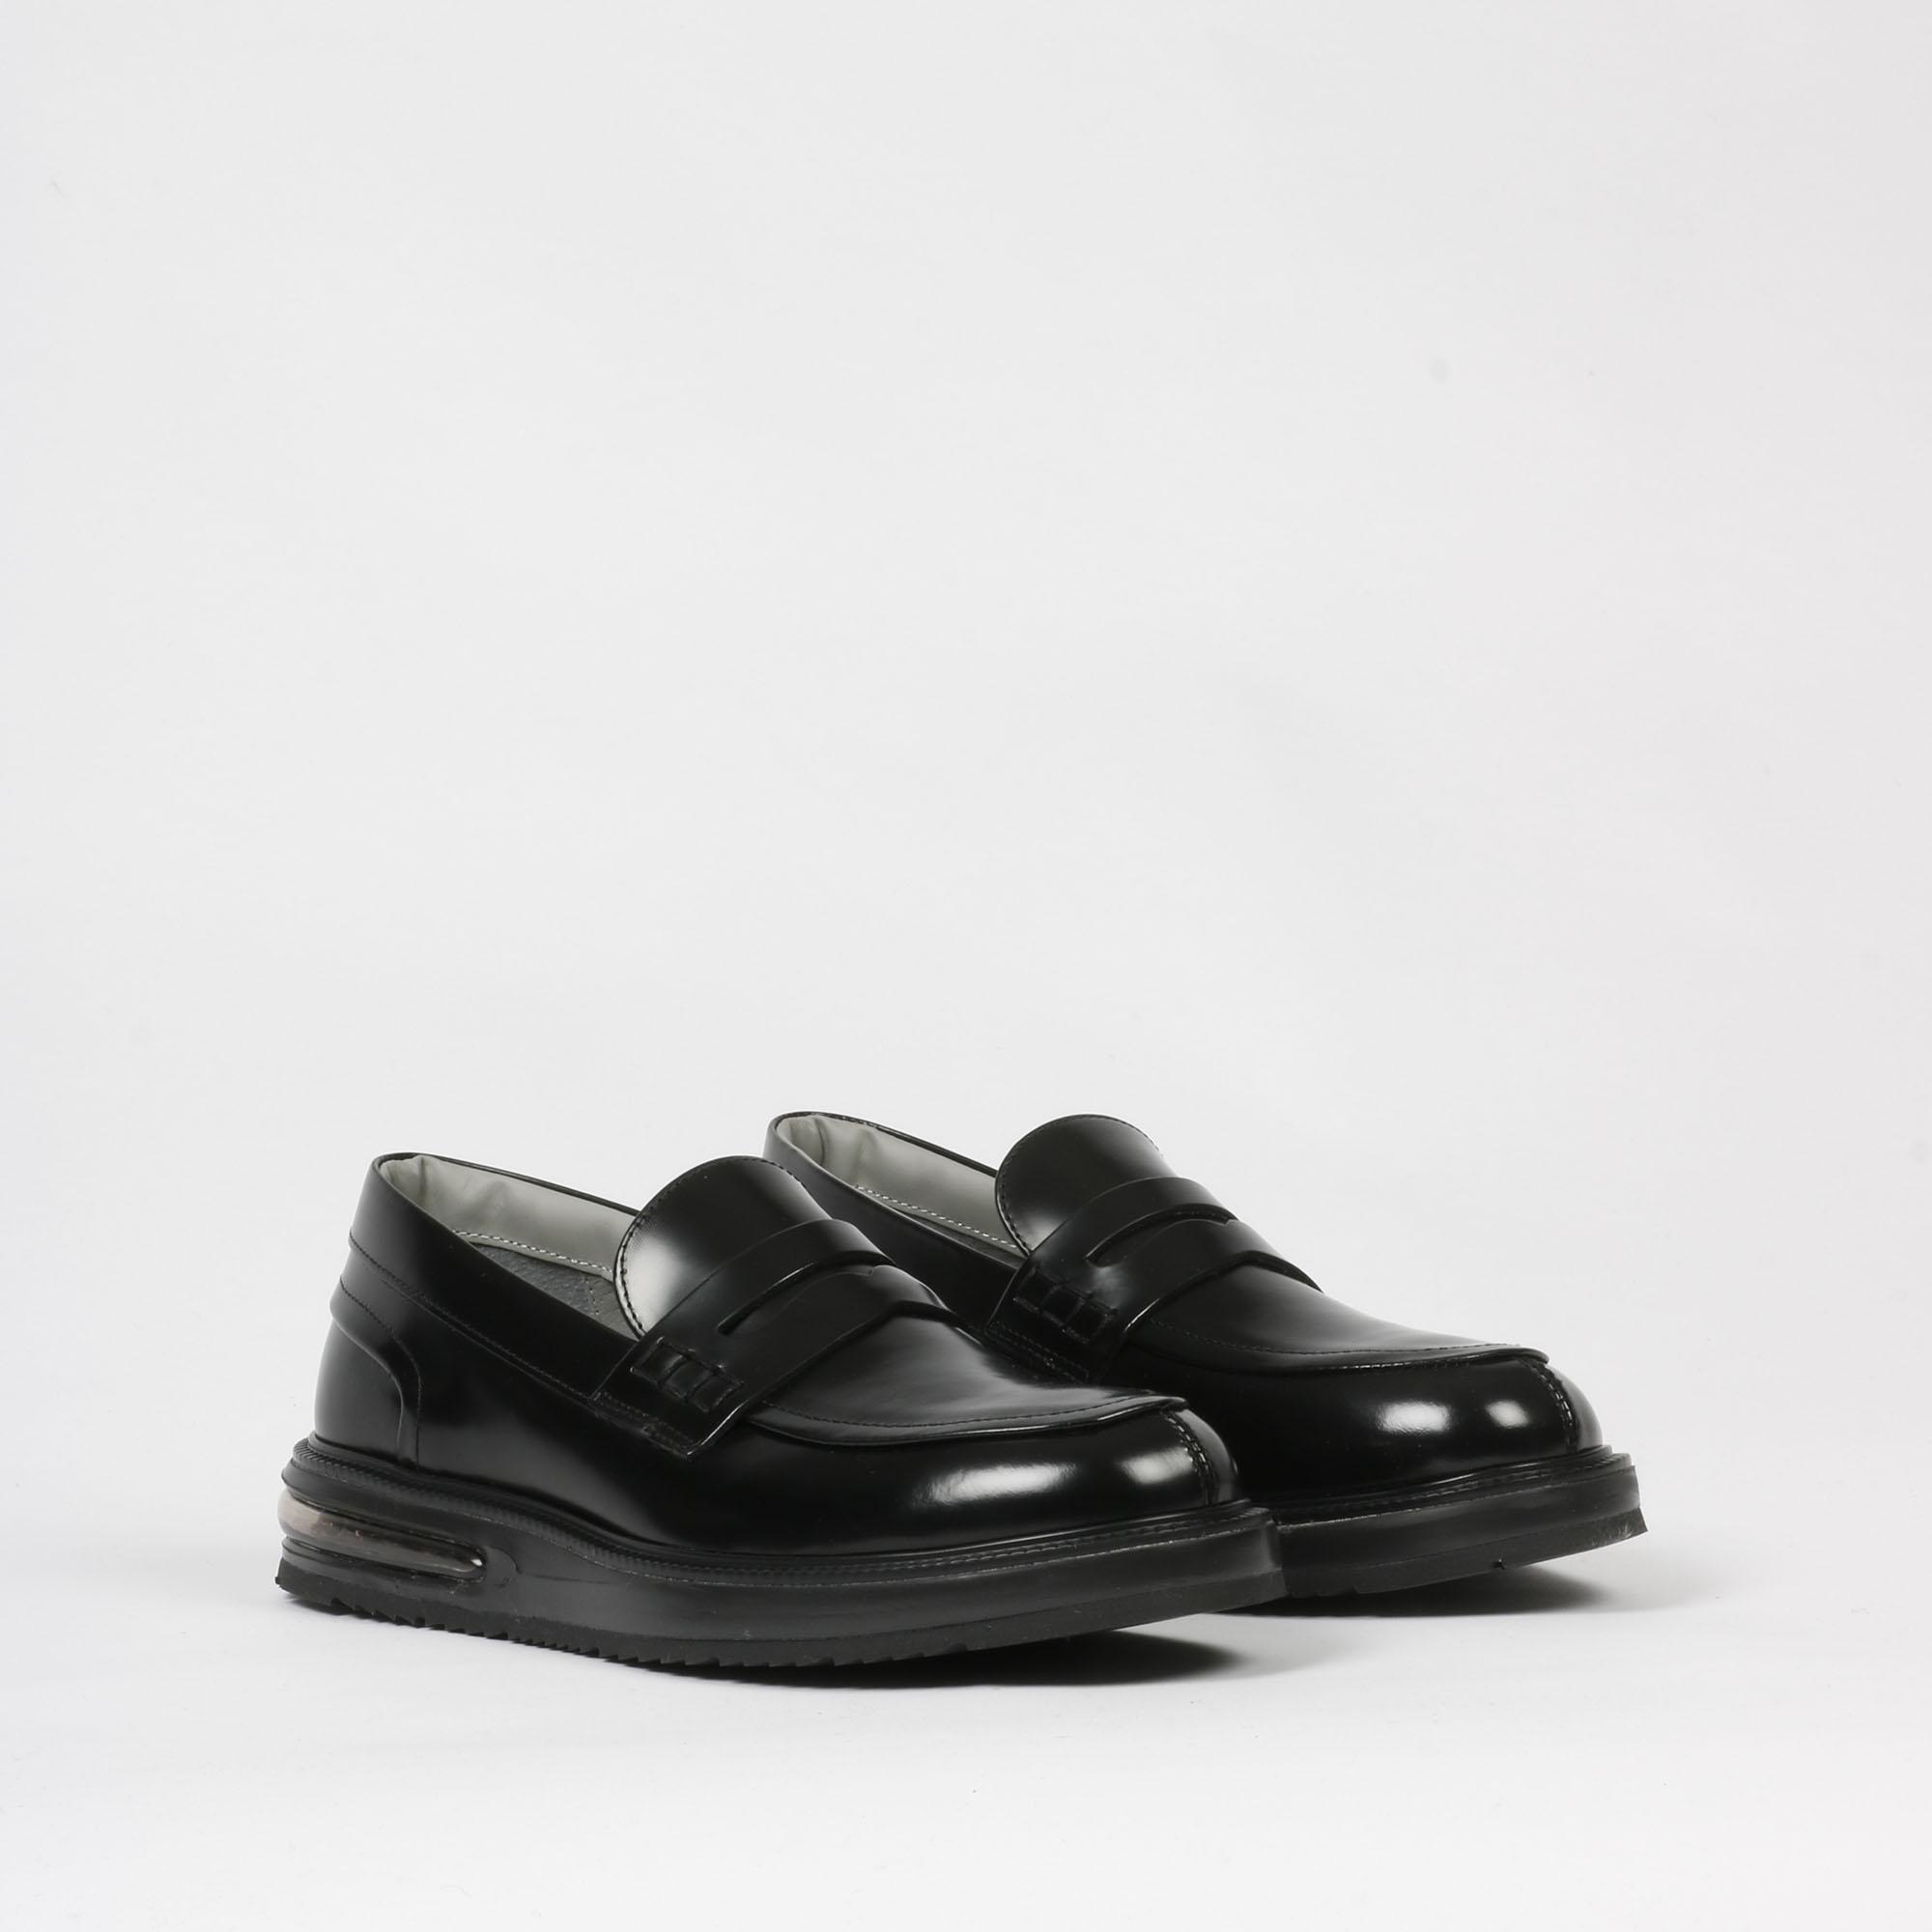 Air mocassin leather - Nero